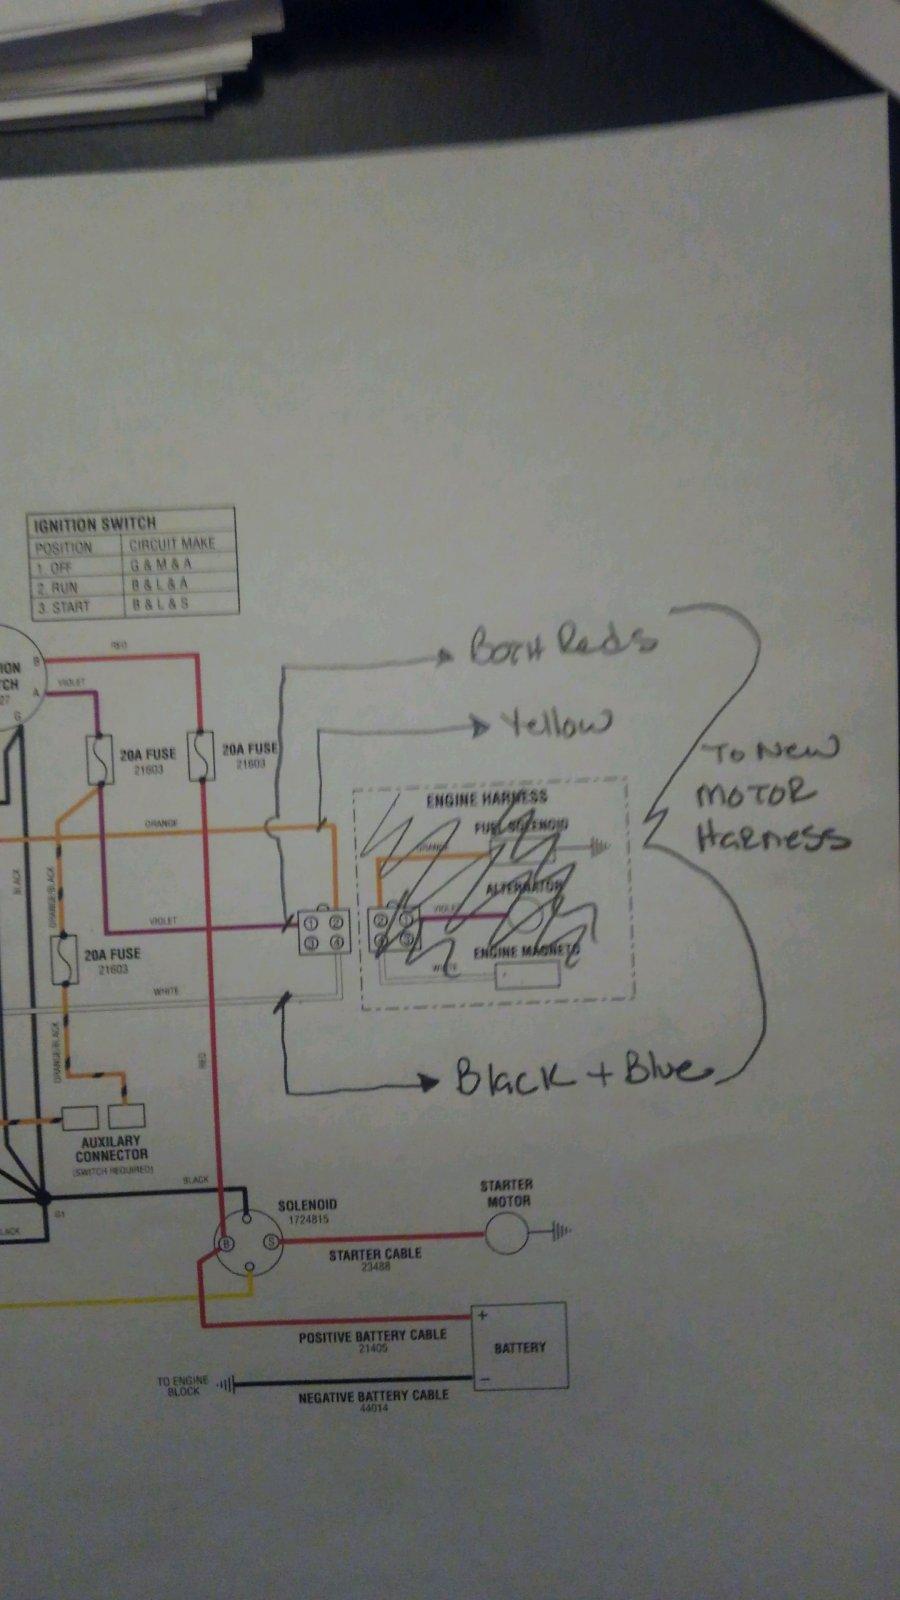 KD_2712] 22 Hp Kawasaki Wiring Diagram Download DiagramArch Orsal Elia Arch Dome Mohammedshrine Librar Wiring 101